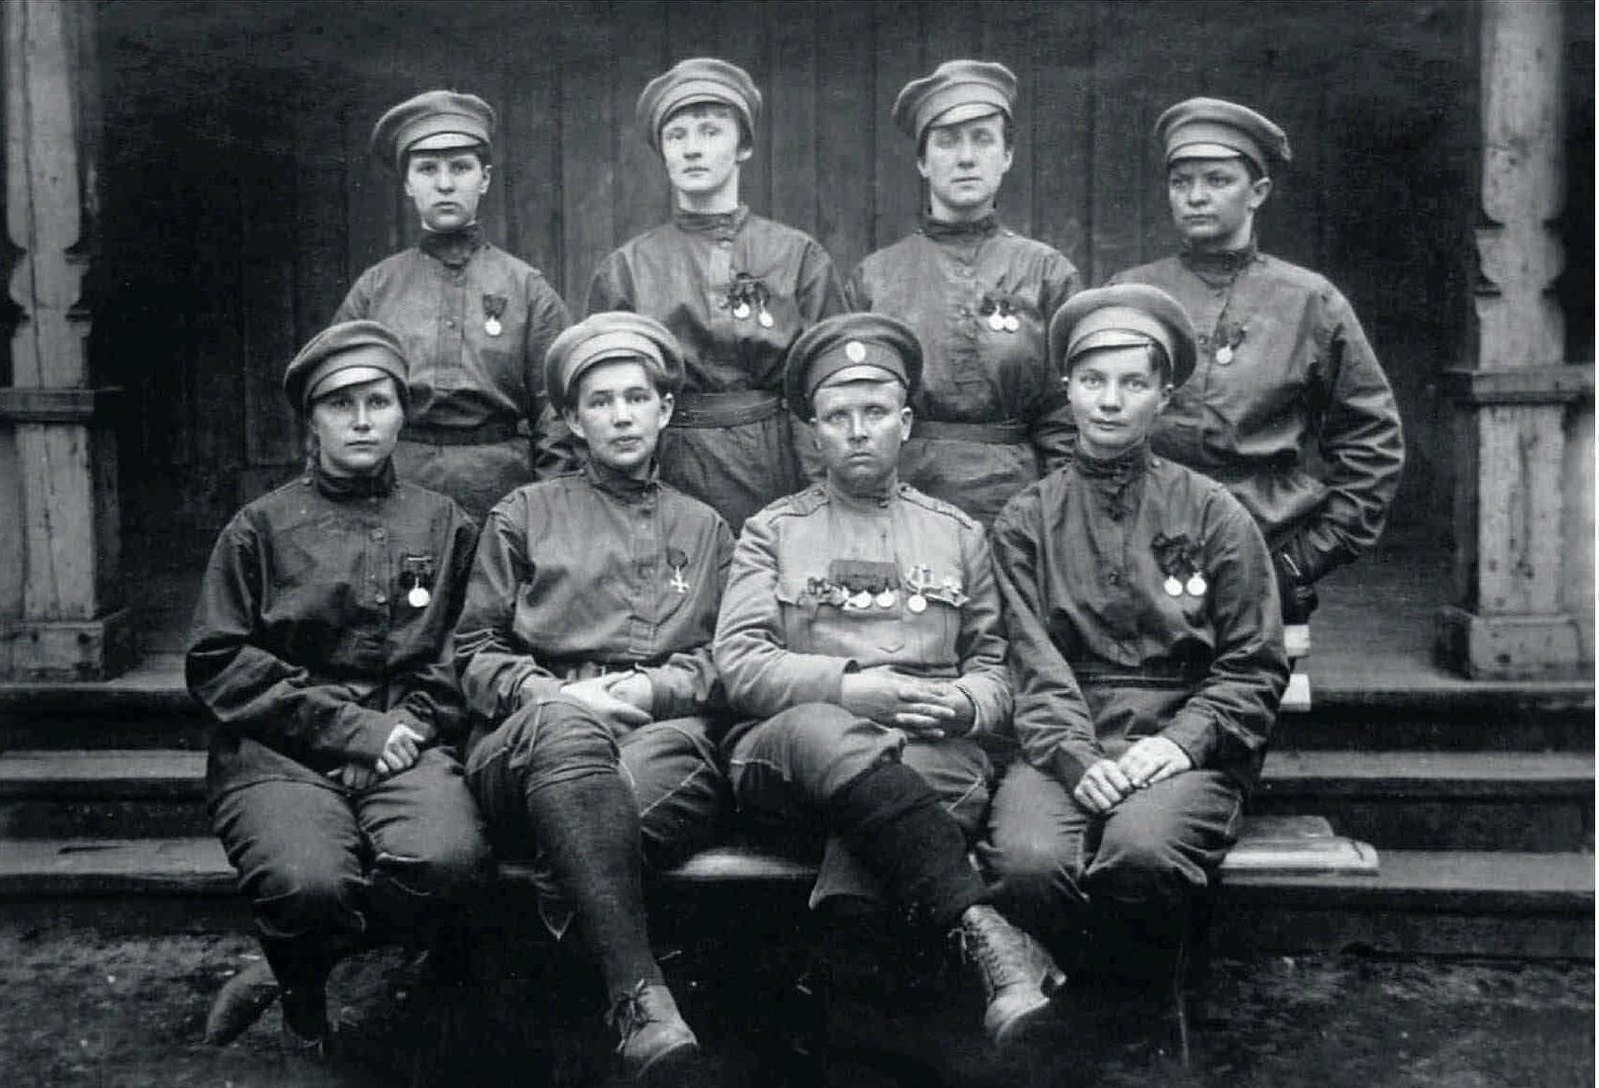 1917. Штаб батальона и его командир Мария Бочкарева